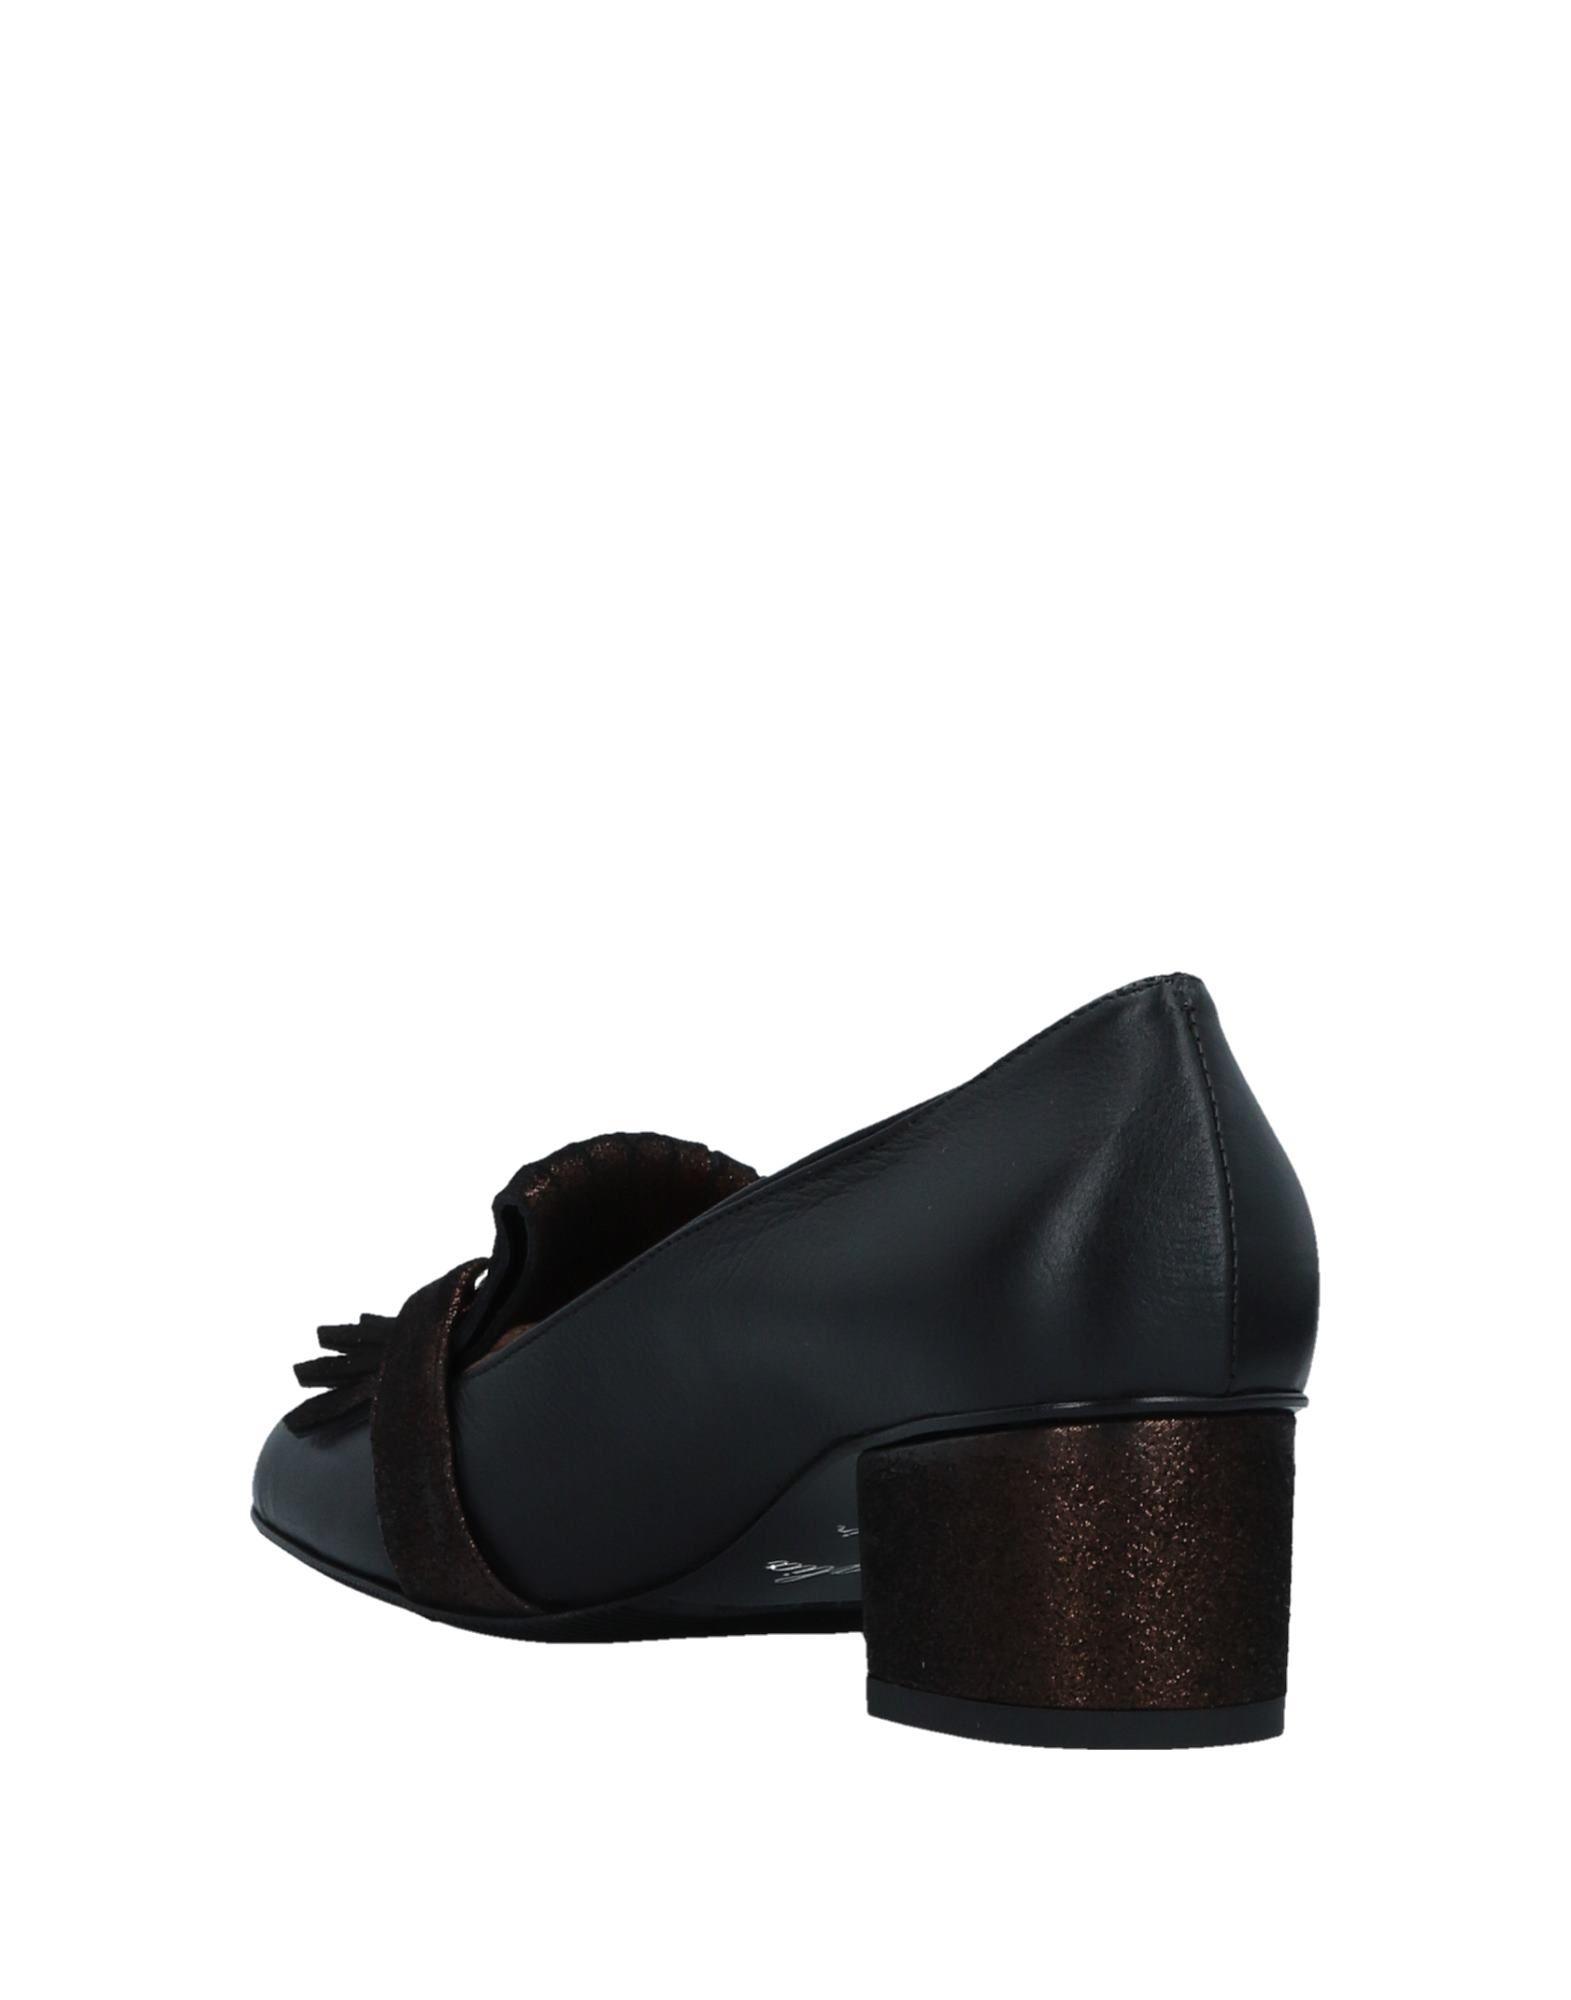 Stilvolle Bruglia billige Schuhe F.Lli Bruglia Stilvolle Mokassins Damen  11520205HG ffa118